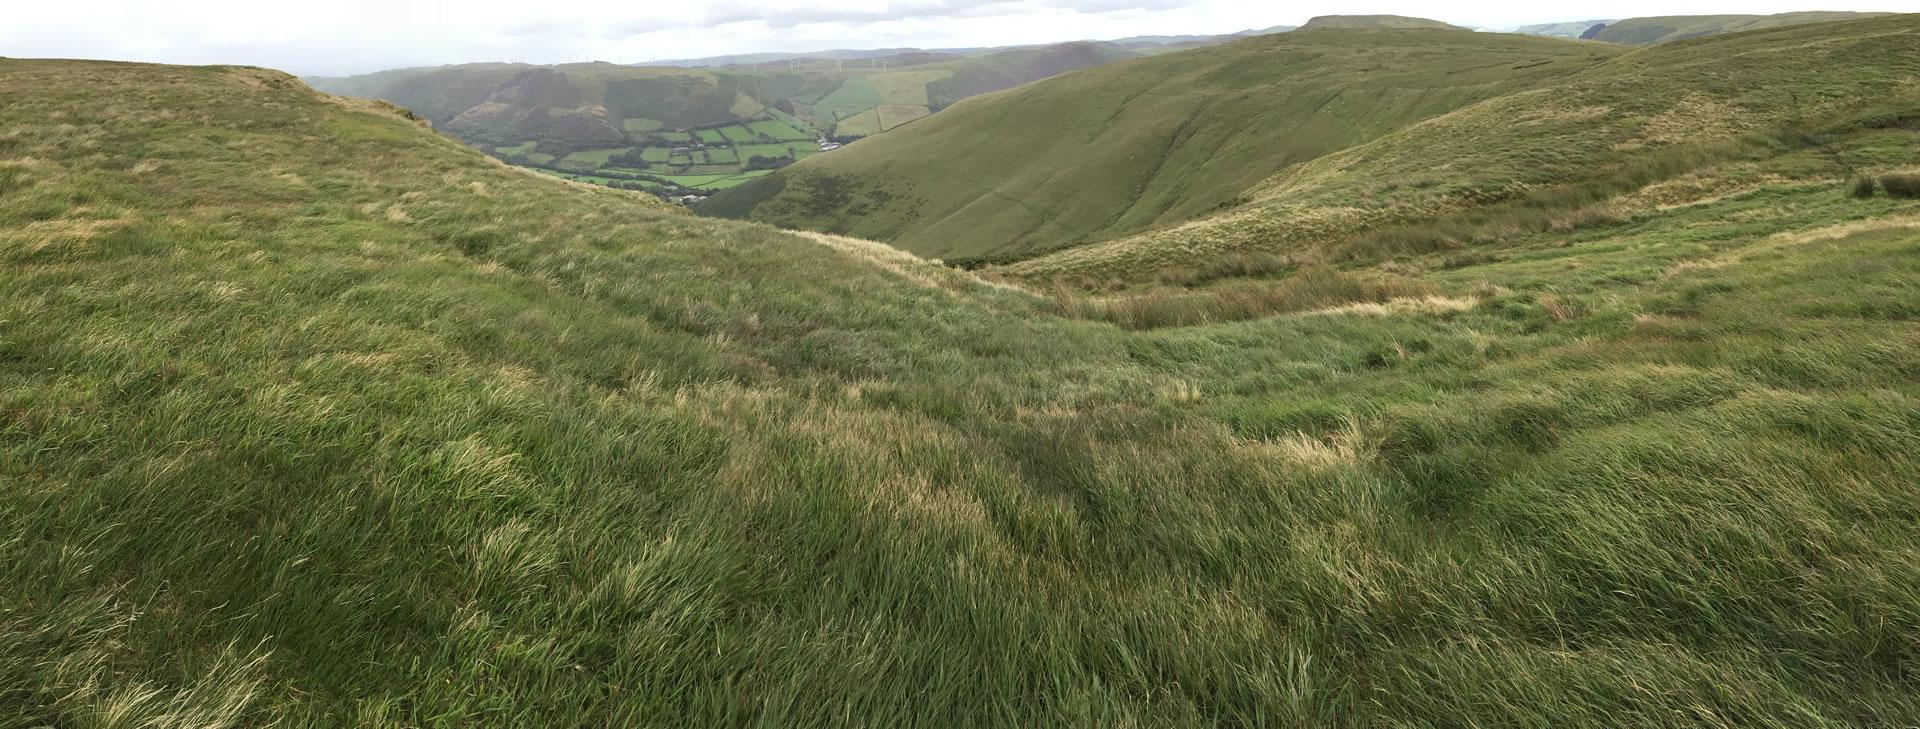 counselling_psychotherapy_IanBurtontherapy_landscape_hills_wind